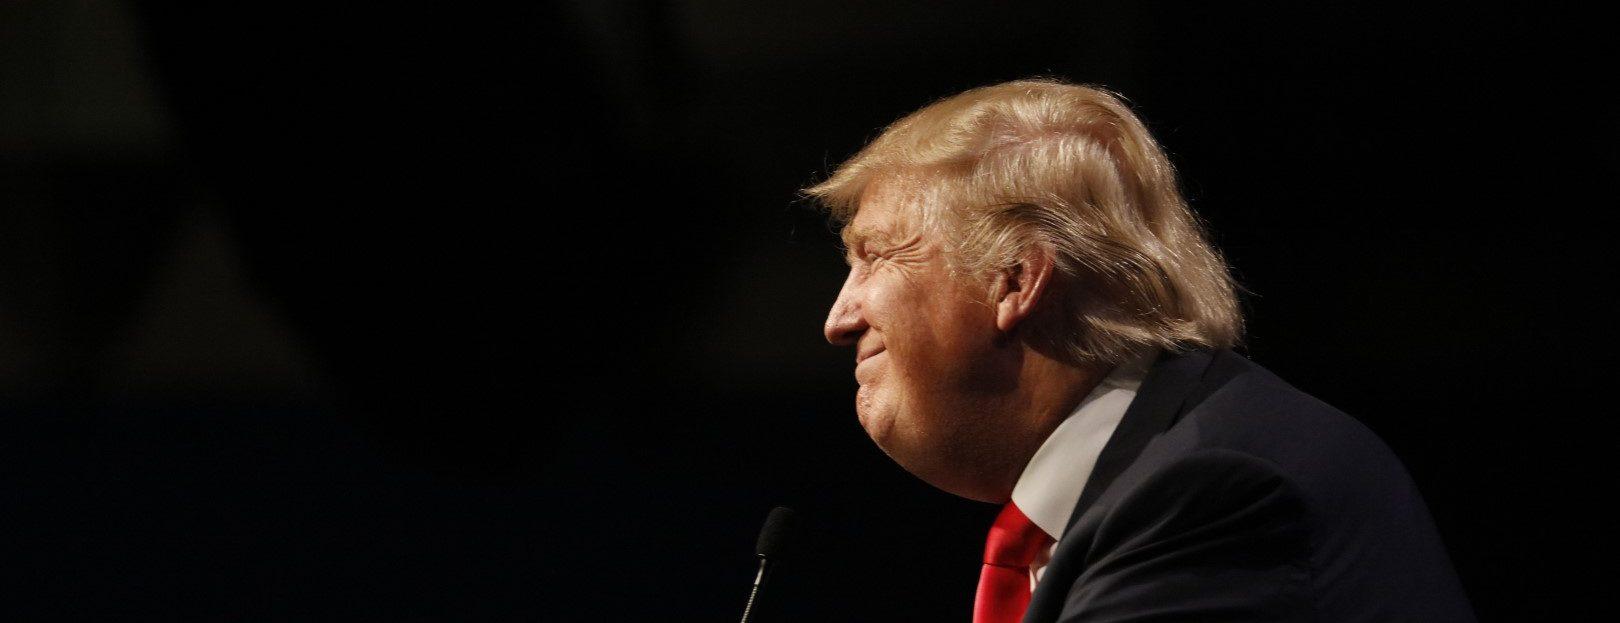 Trump-08.24.16-Large-e1472077686504.jpg